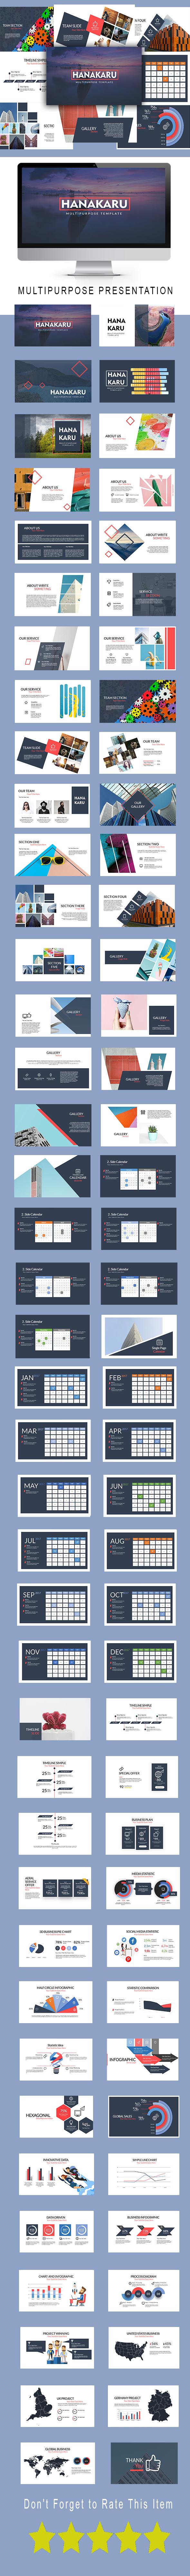 Hanakaru Multipurpose Powerpoint Template - PowerPoint Templates Presentation Templates